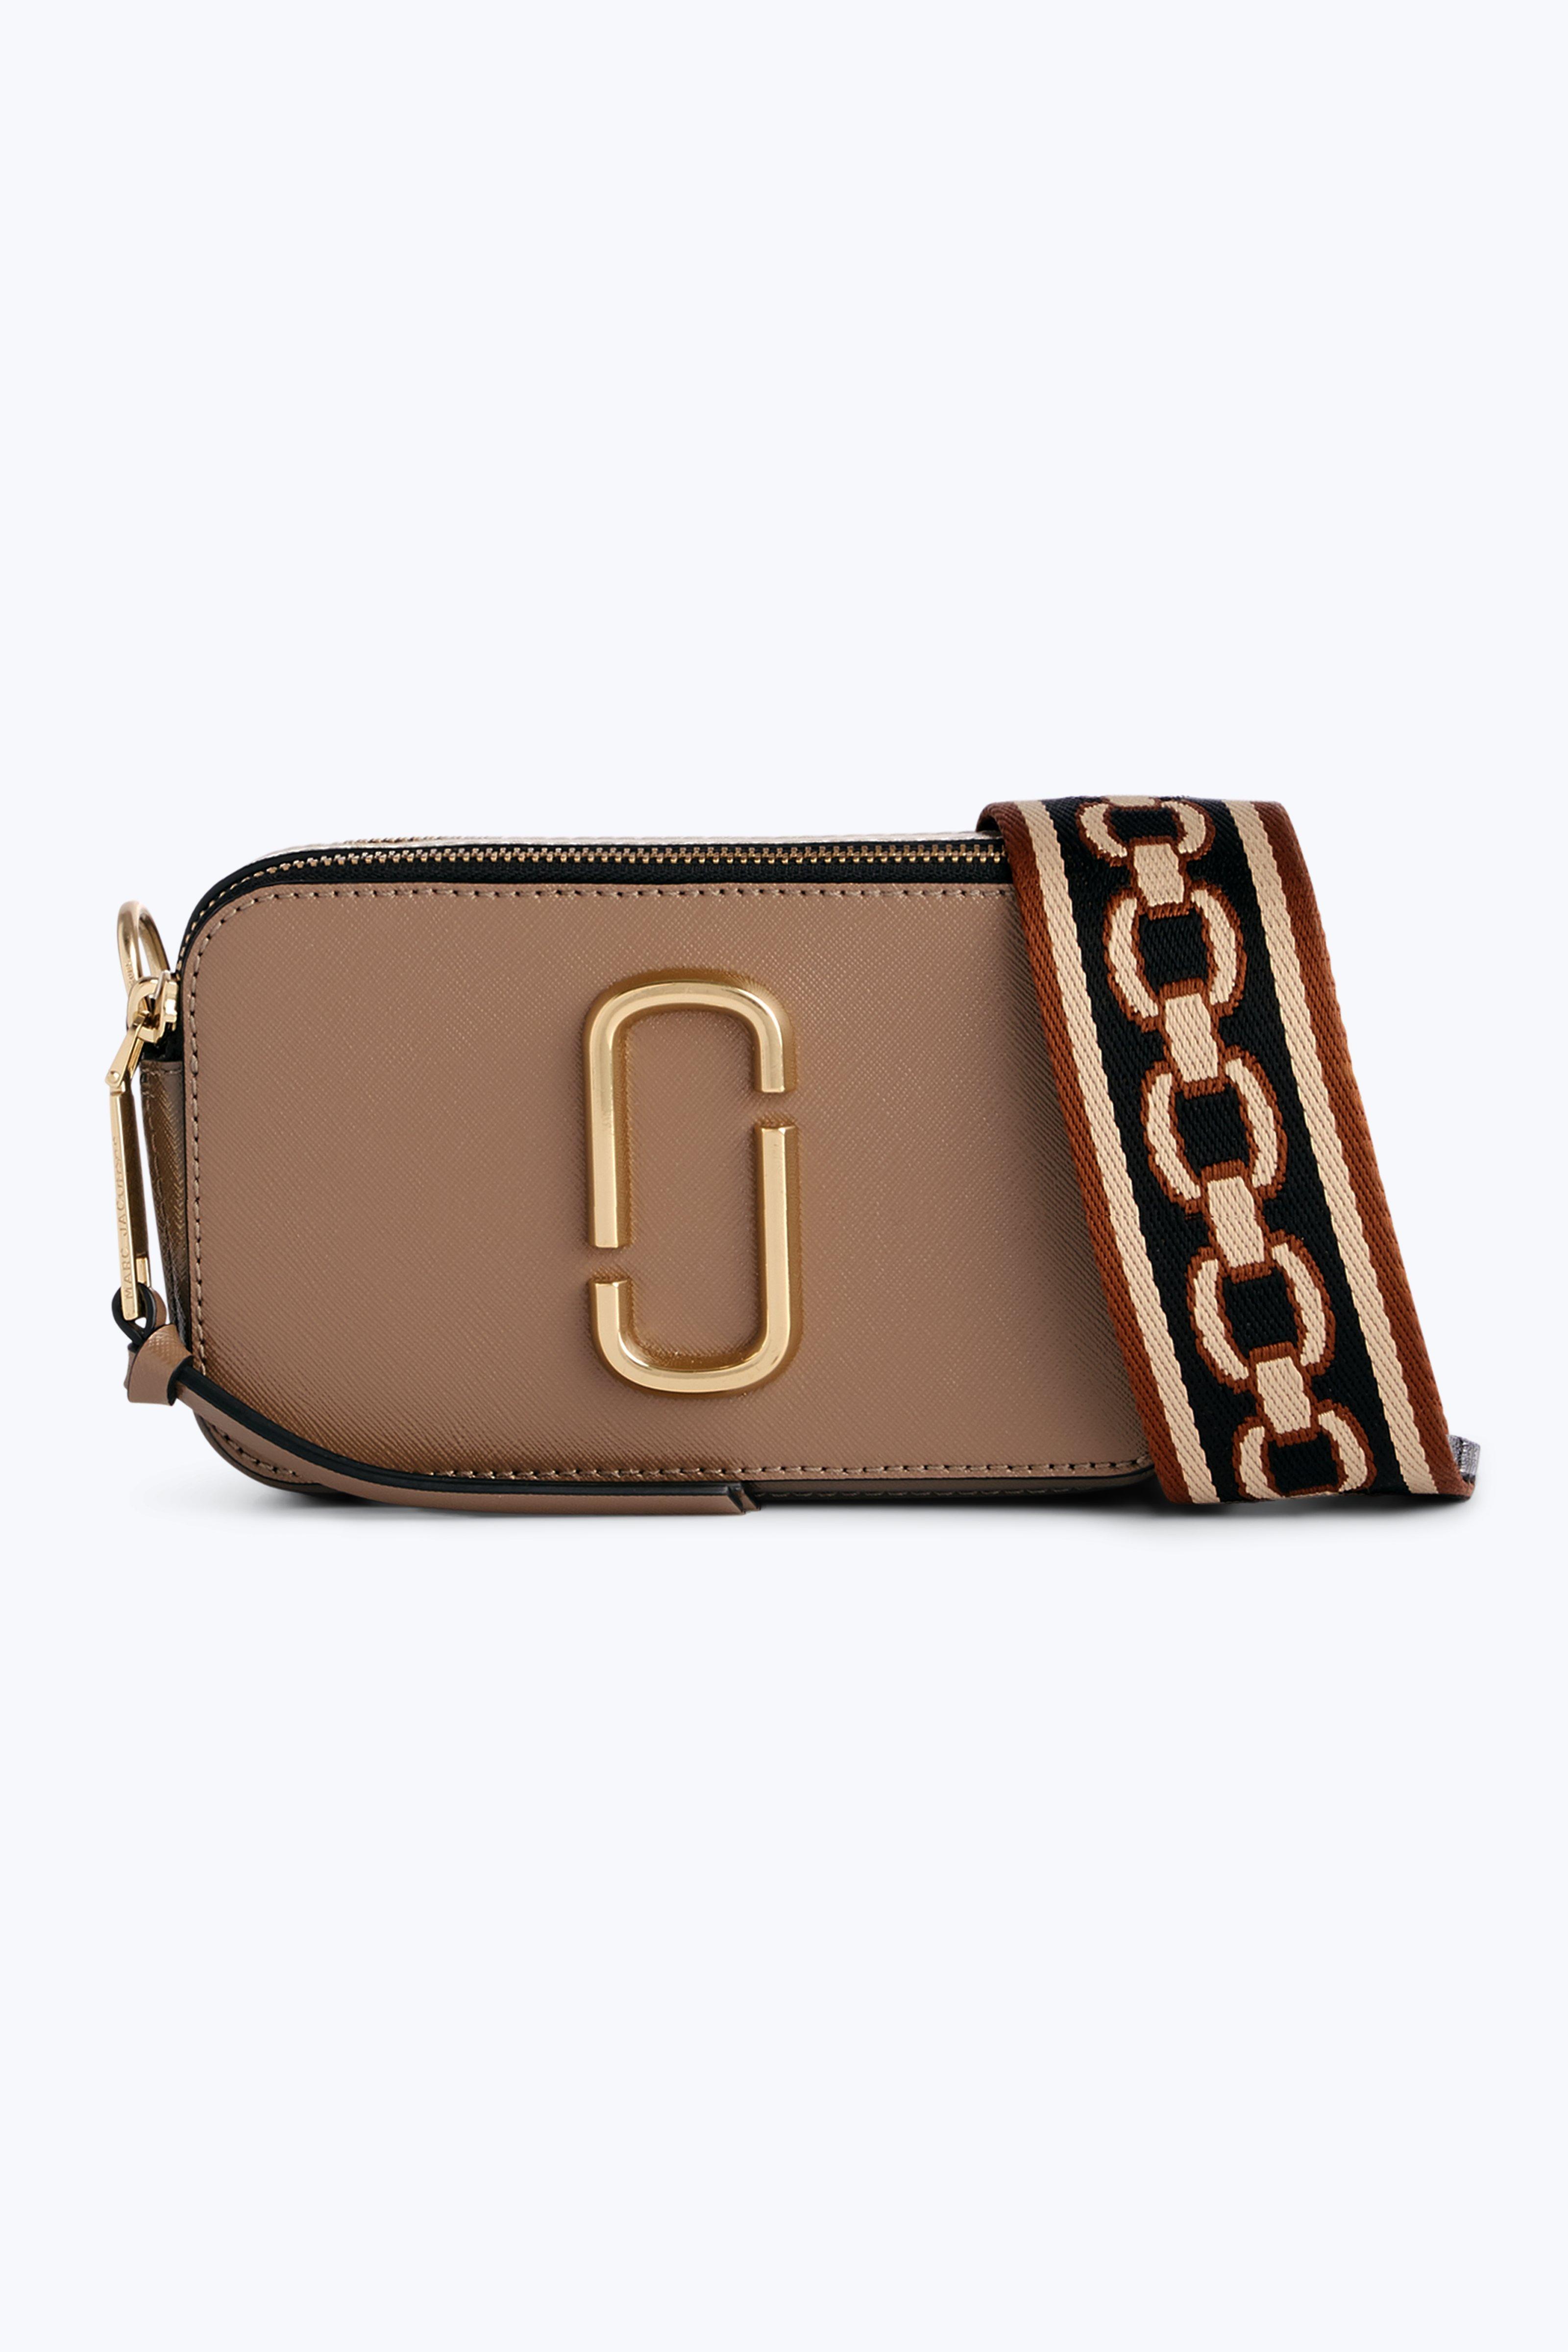 9077fd397973 Marc Jacobs Snapshot Colour-Block Leather Shoulder Bag In Grey ...